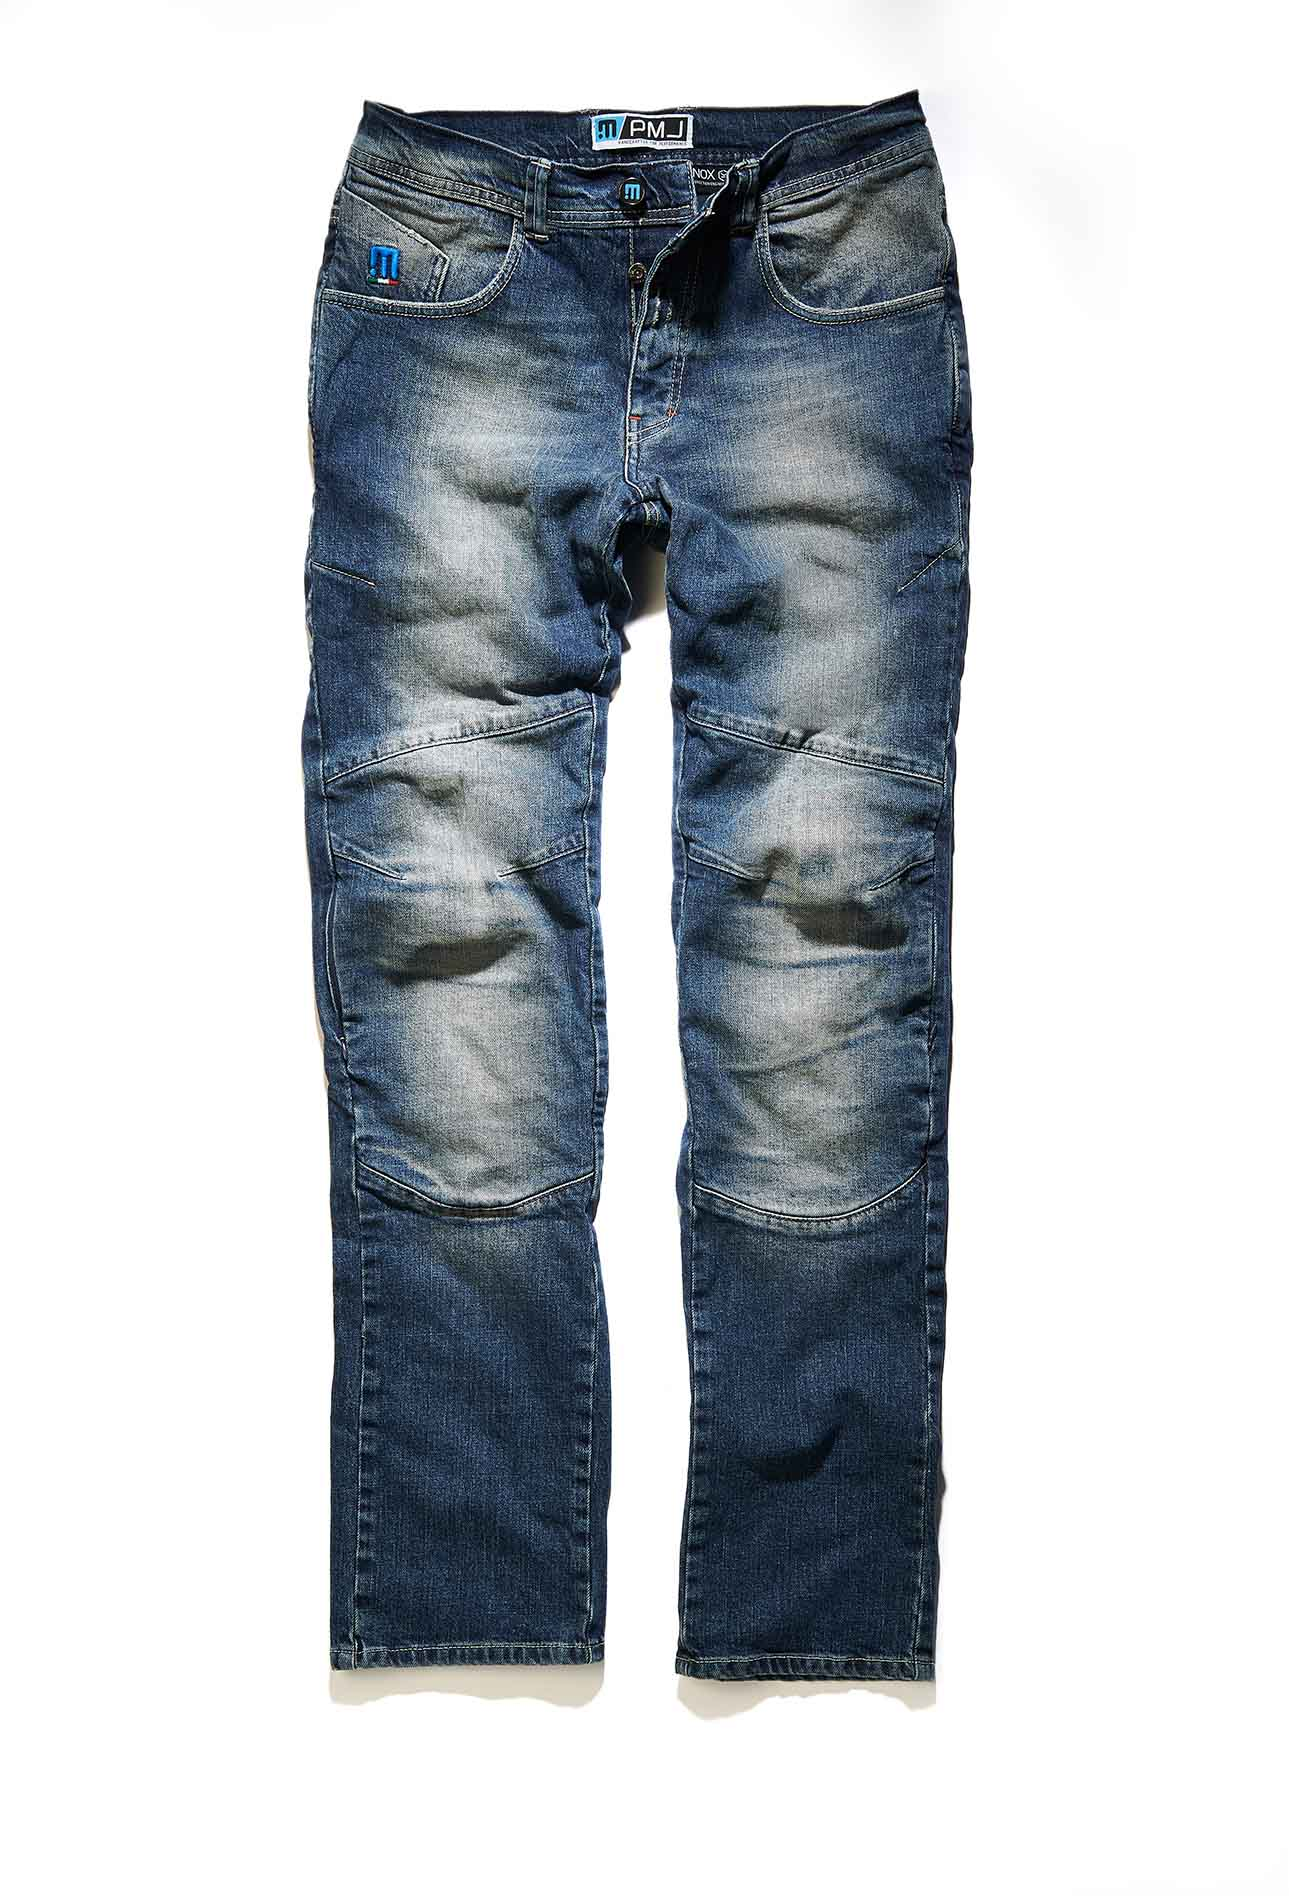 Promojeans PMJ Vegas Denim Medio Motorcycle Jeans 34